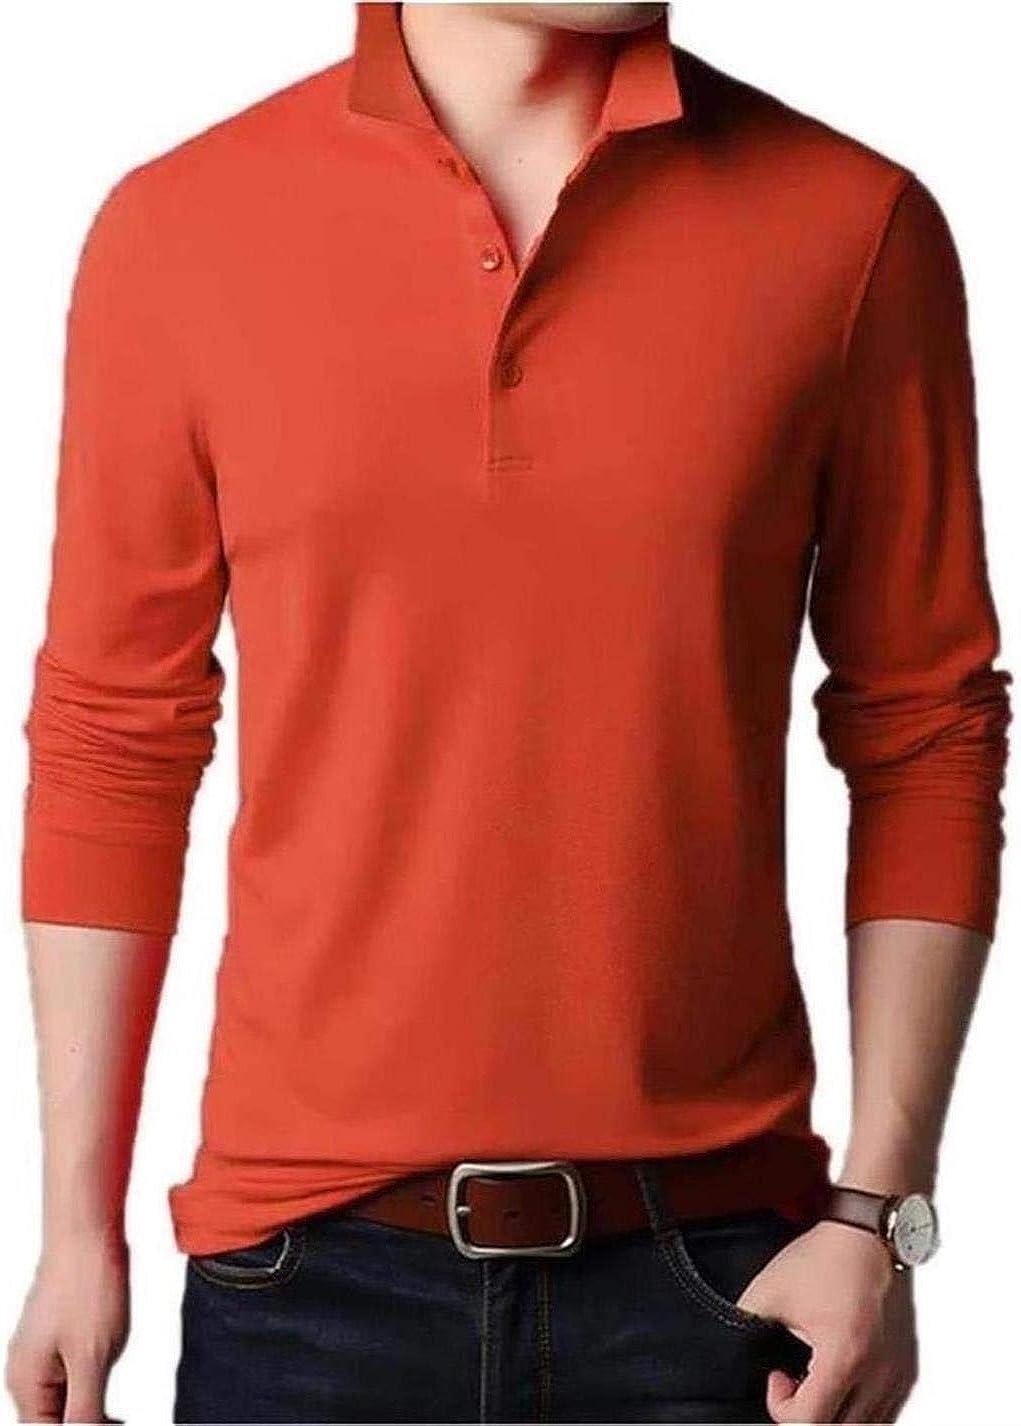 Aiyino Mens Short Sleeve Polo Shirts Casual Slim Fit Basic Designed Cotton Shirts